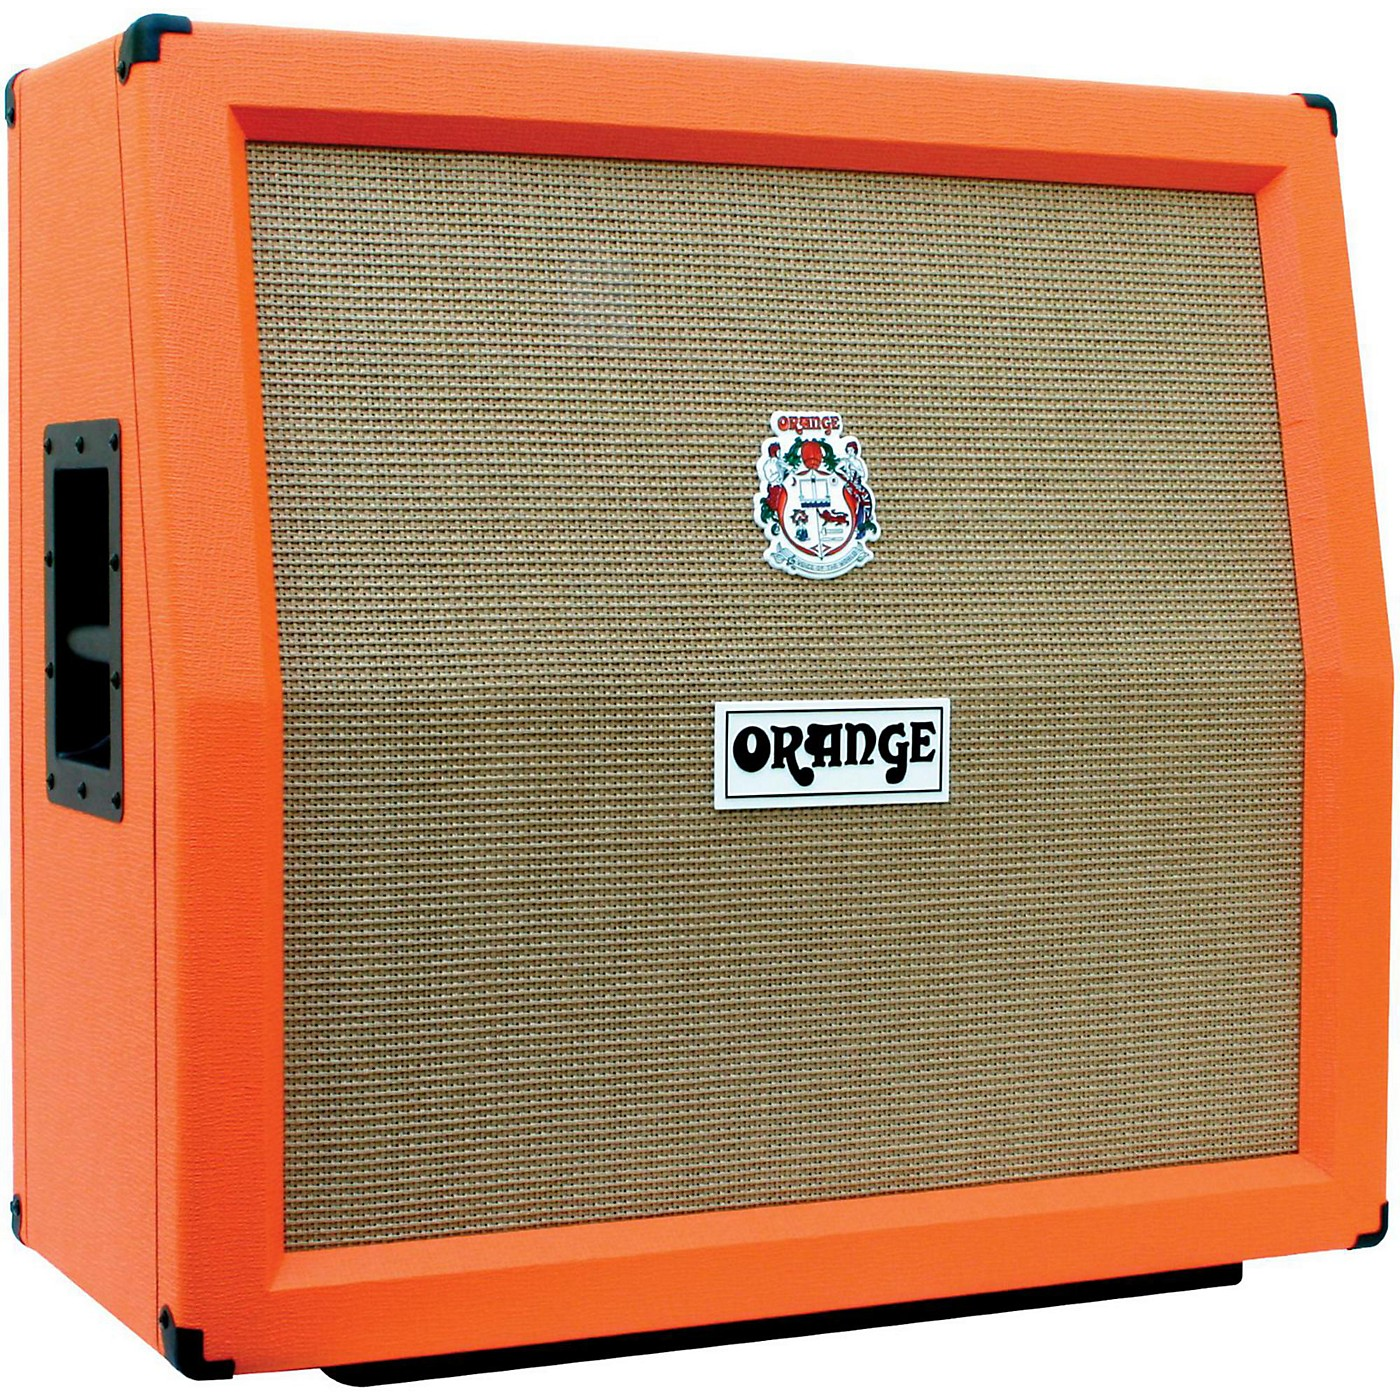 Orange Amplifiers PPC Series PPC412-A 240W 4x12 Guitar Speaker Cabinet thumbnail